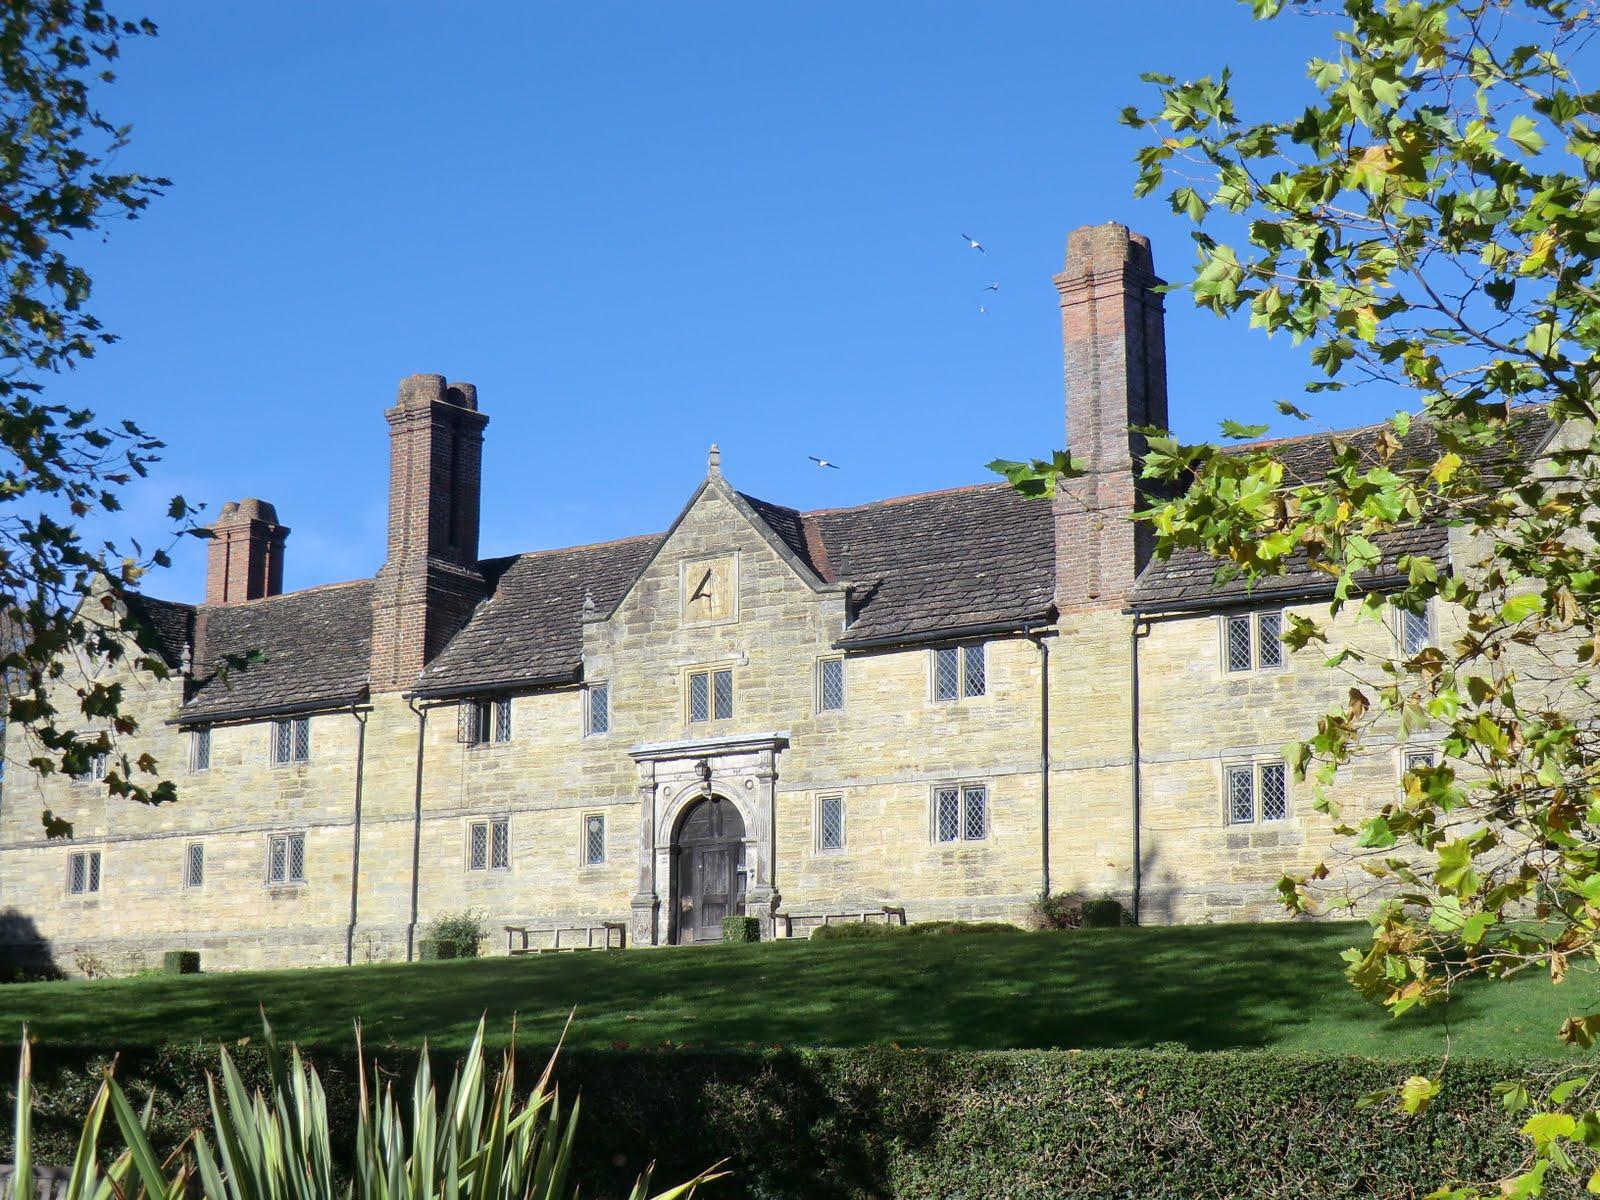 CIMG9275 Sackville College, East Grinstead